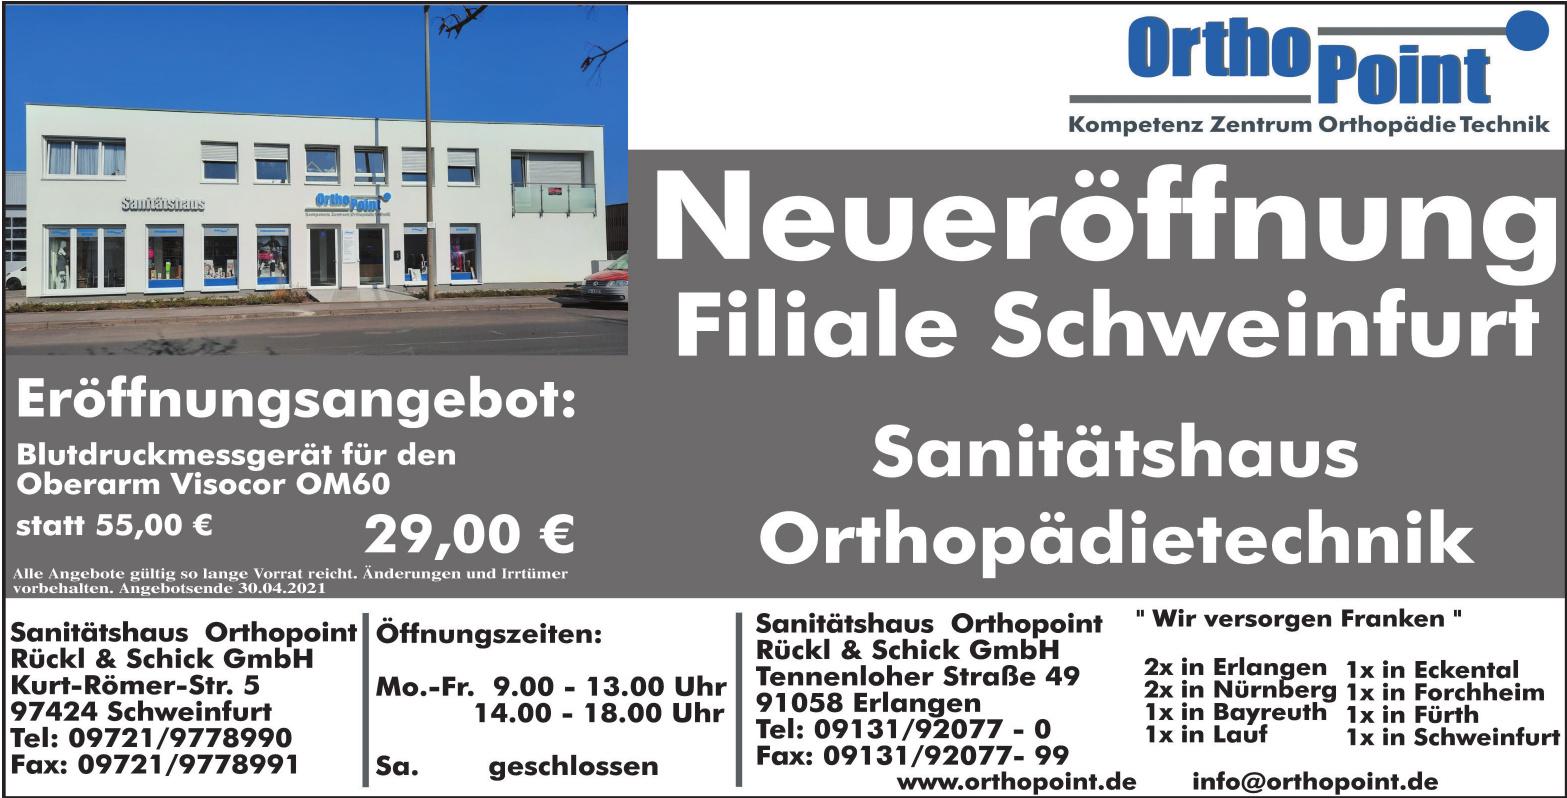 Sanitätshaus Orthopoint Rückl & Schick GmbH